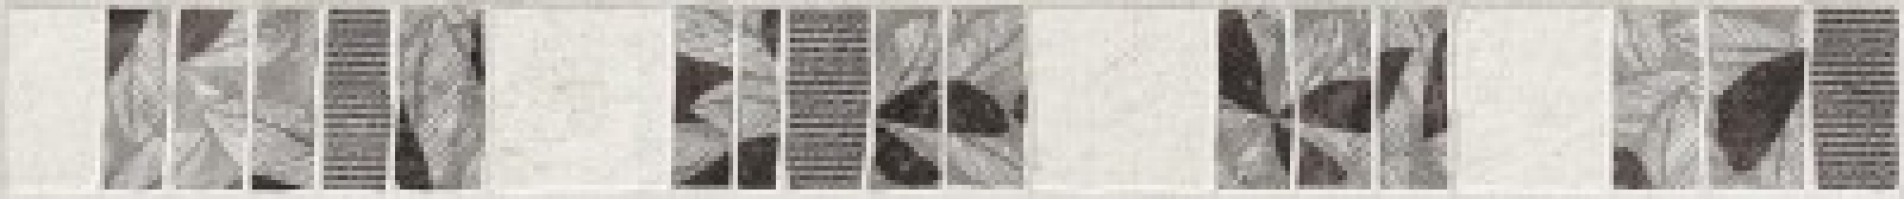 Бордюр Sand серый 6.3x60 Laparet